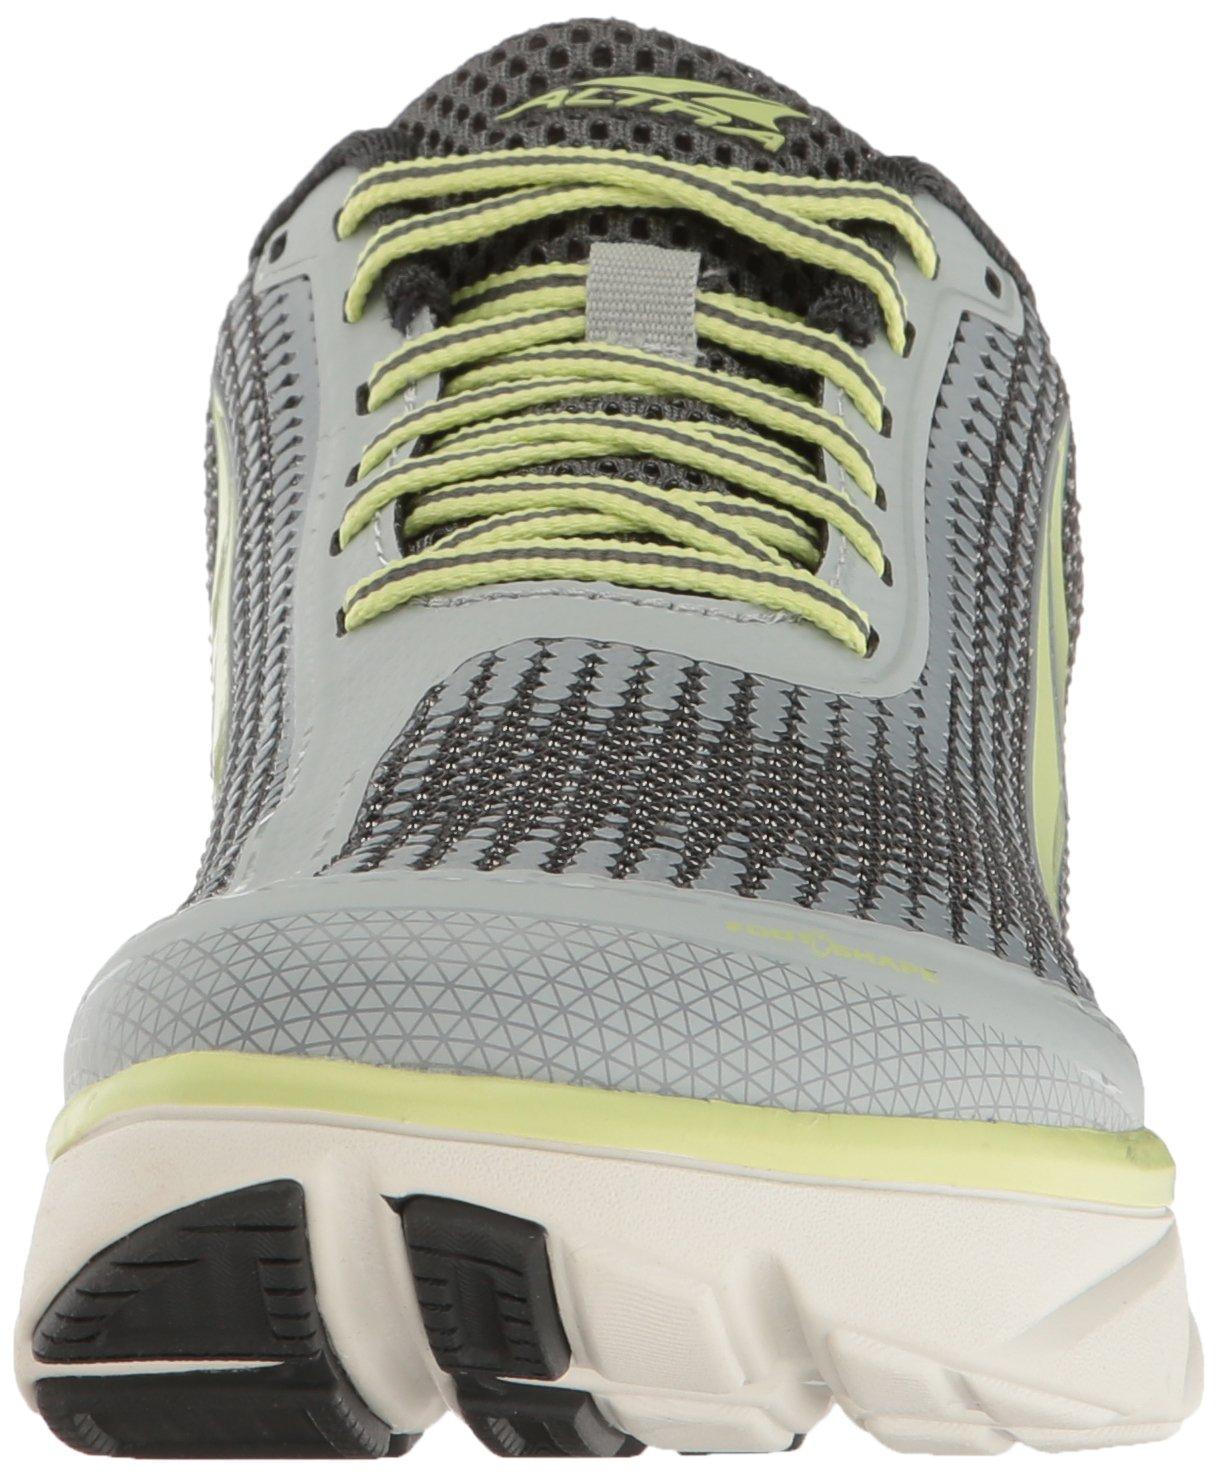 Altra Women's Torin 3.0 Running-Shoes B01MU358EC 8 B(M) US|Lime